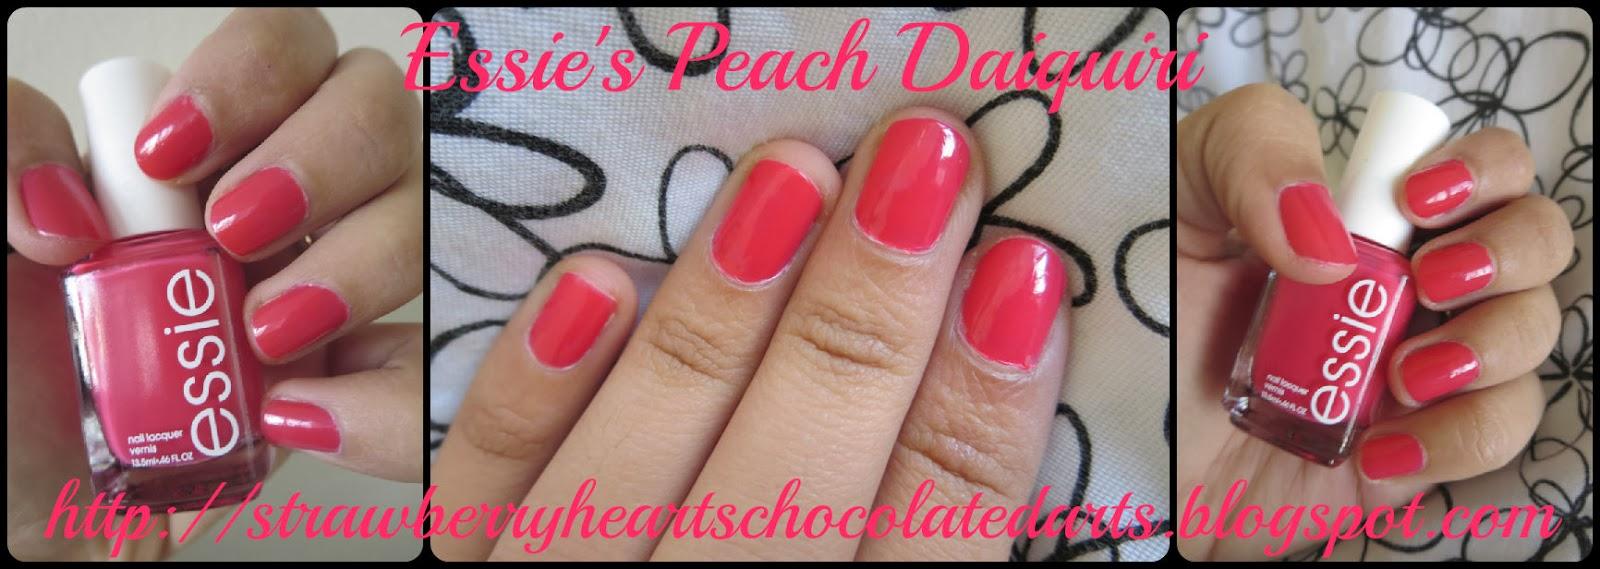 Strawberry Hearts Chocolate Darts: Essie Nail Polish in Peach Daiquiri